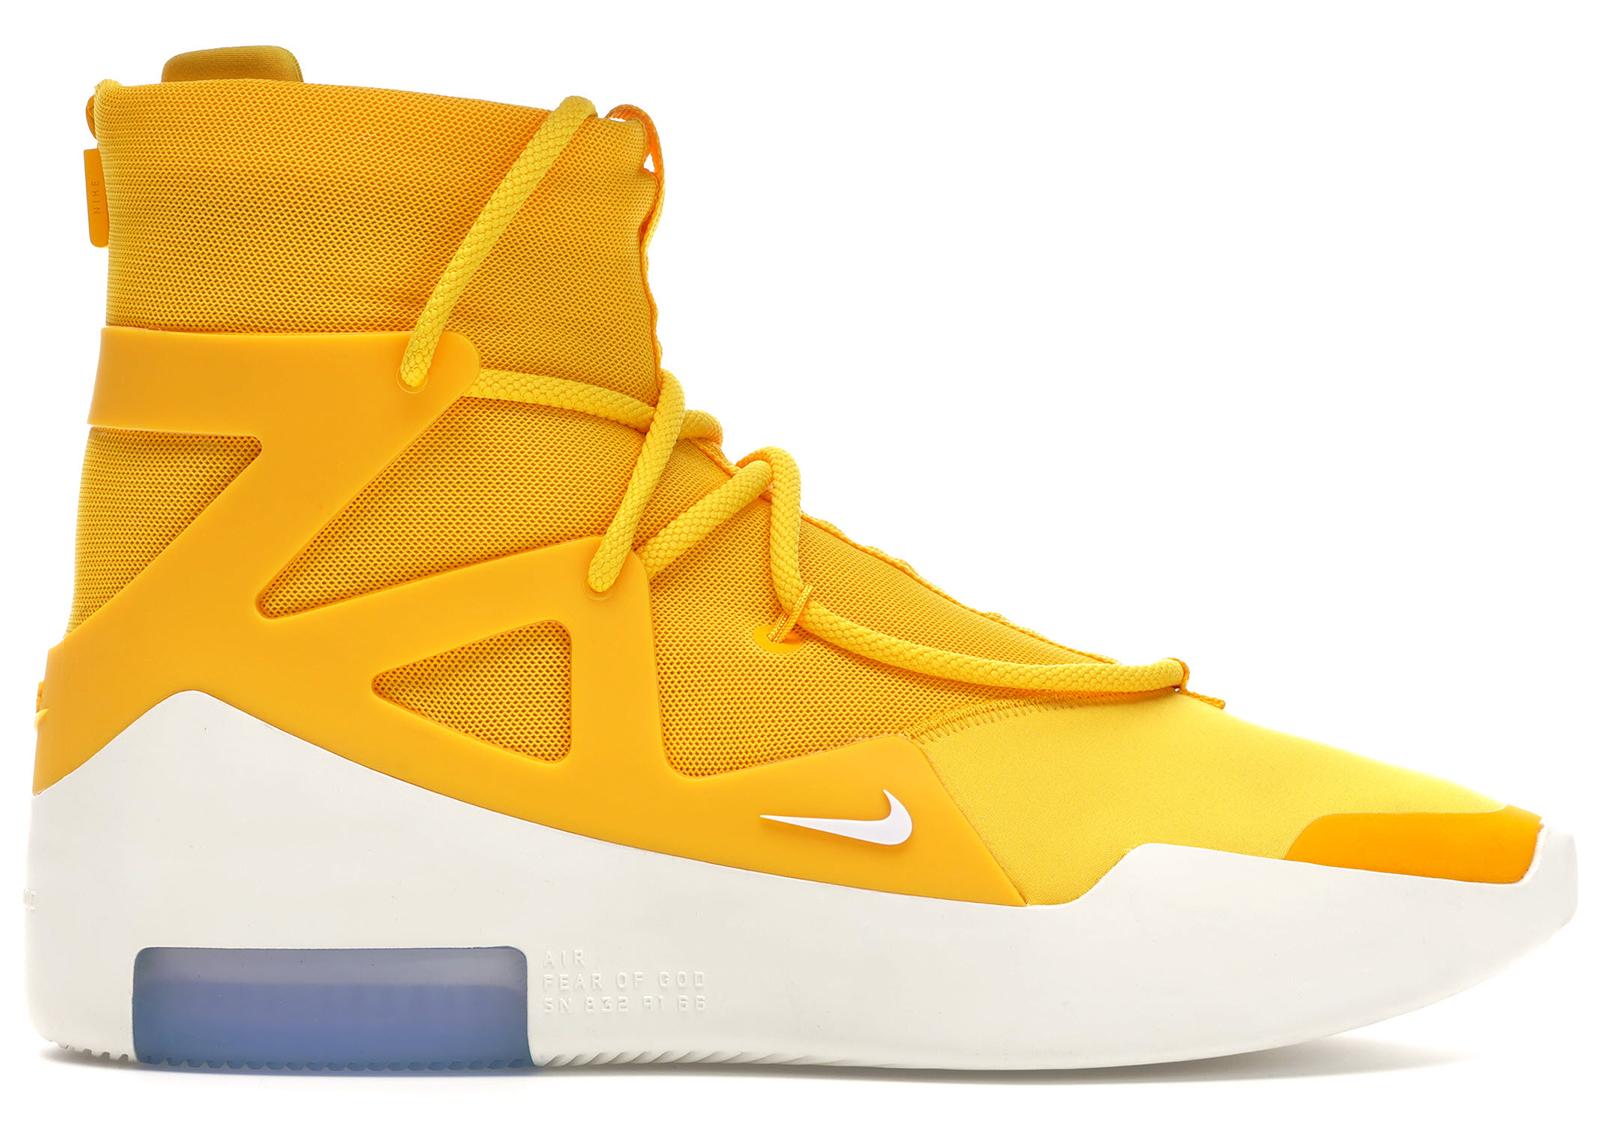 Nike Air Fear Of God 1 Yellow - AR4237-700